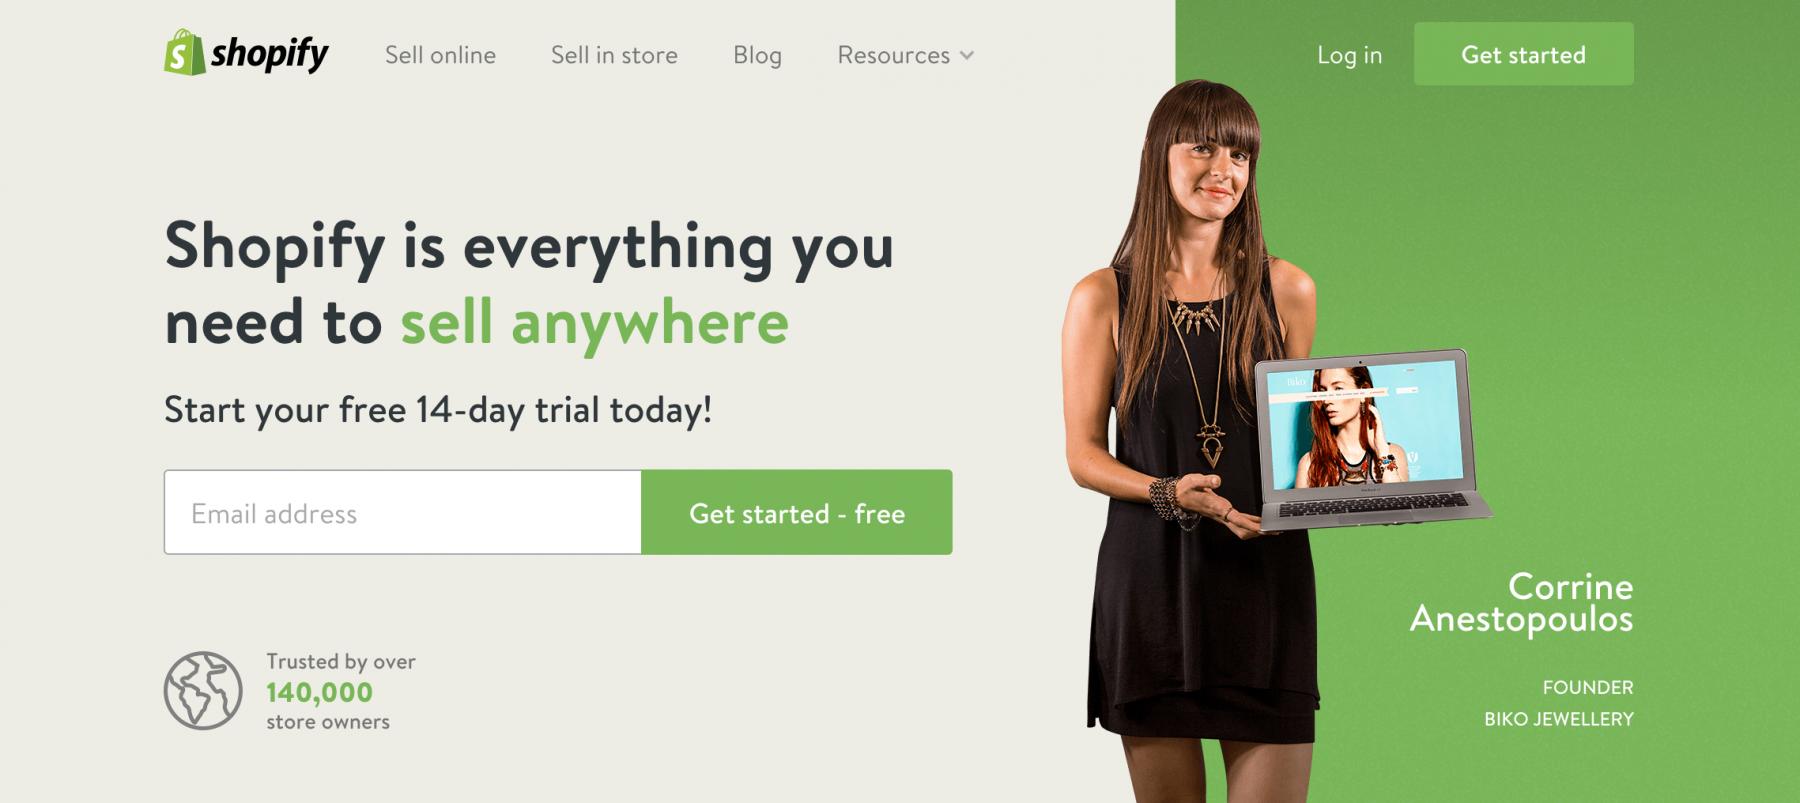 Shopify us e-store marketing website